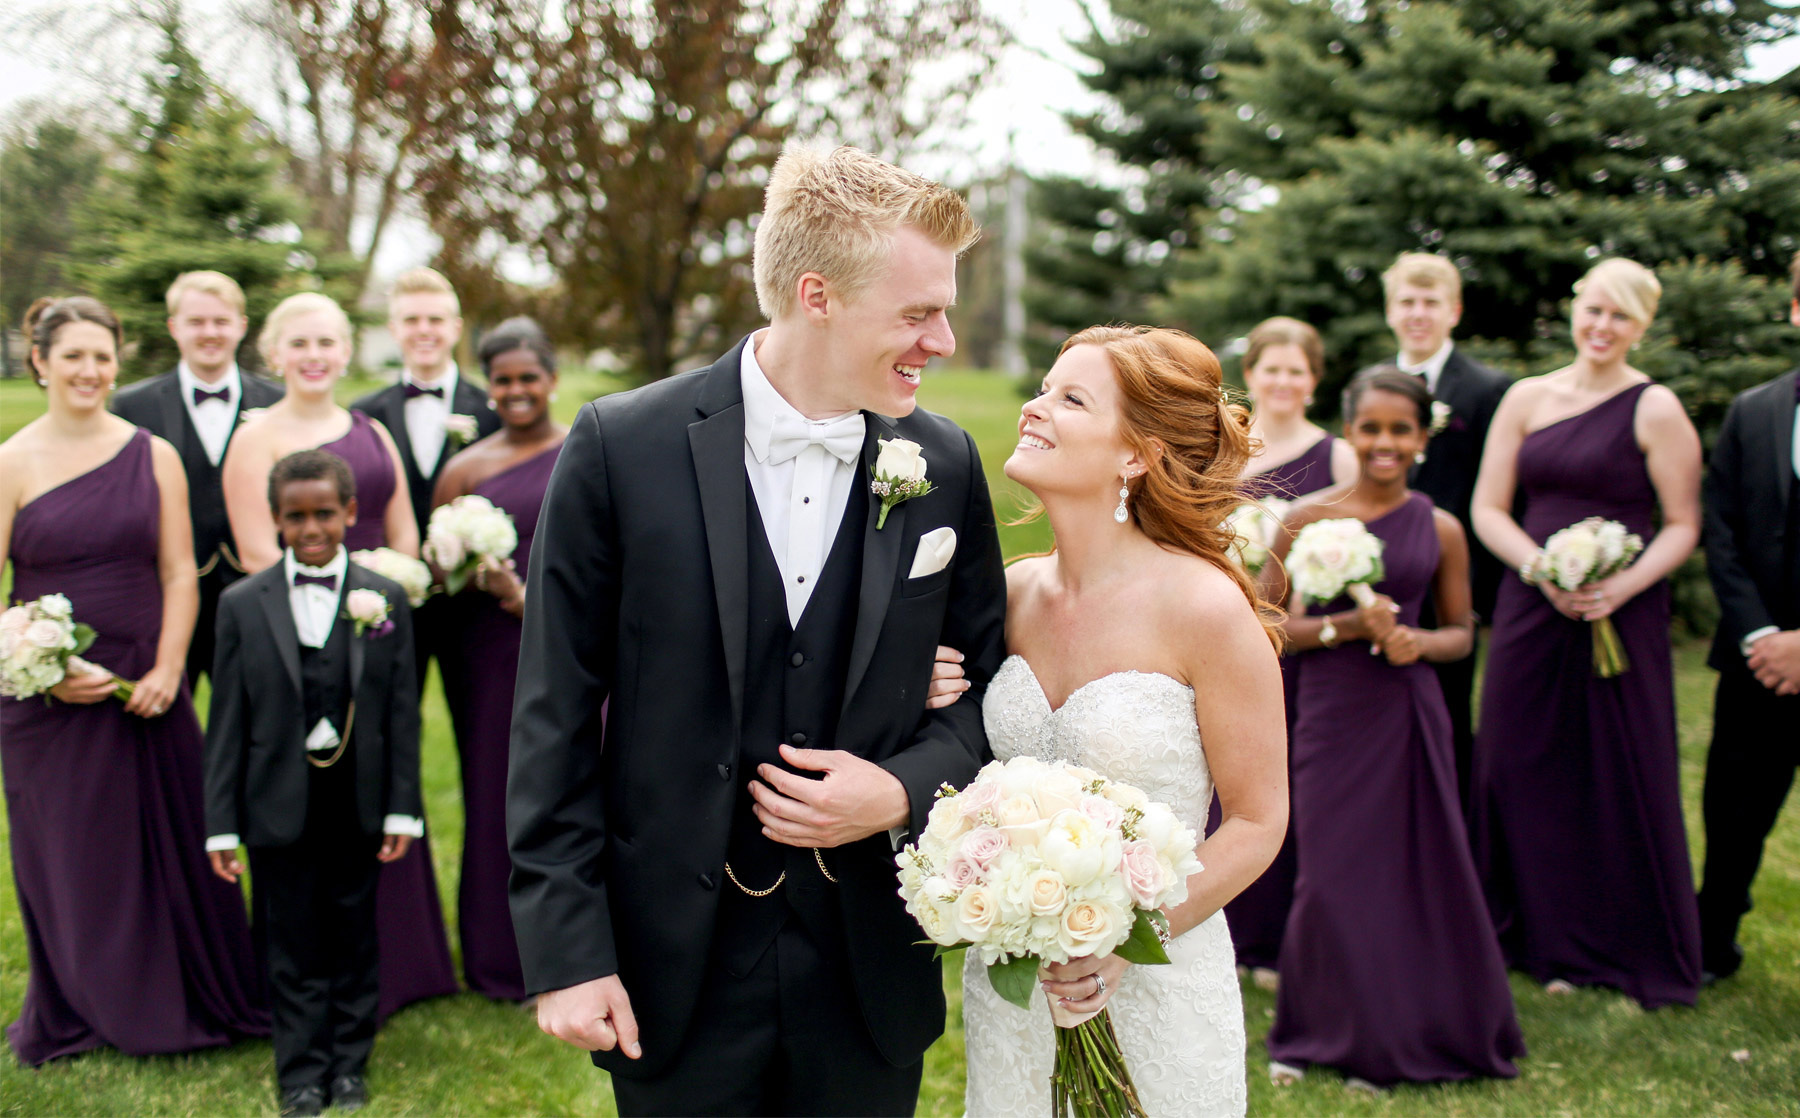 06-Minneapolis-Minnesota-Wedding-Photography-by-Vick-Photography-Wedding-Party-Group-Tianna-&-Matt.jpg